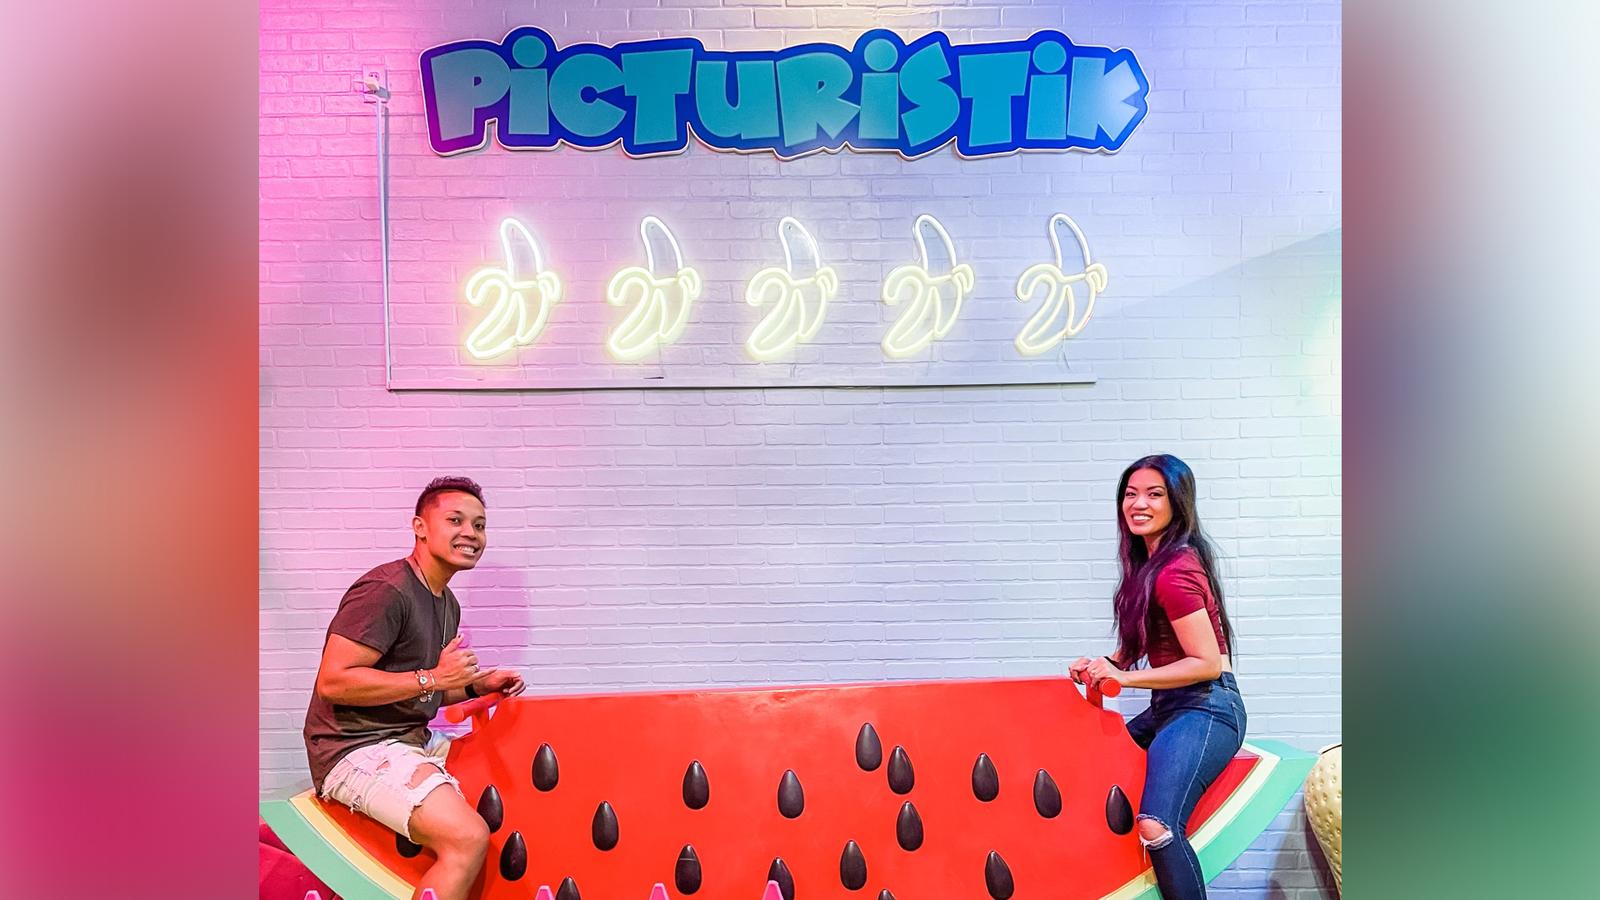 Create colorful memories at Picturistik in Burbank